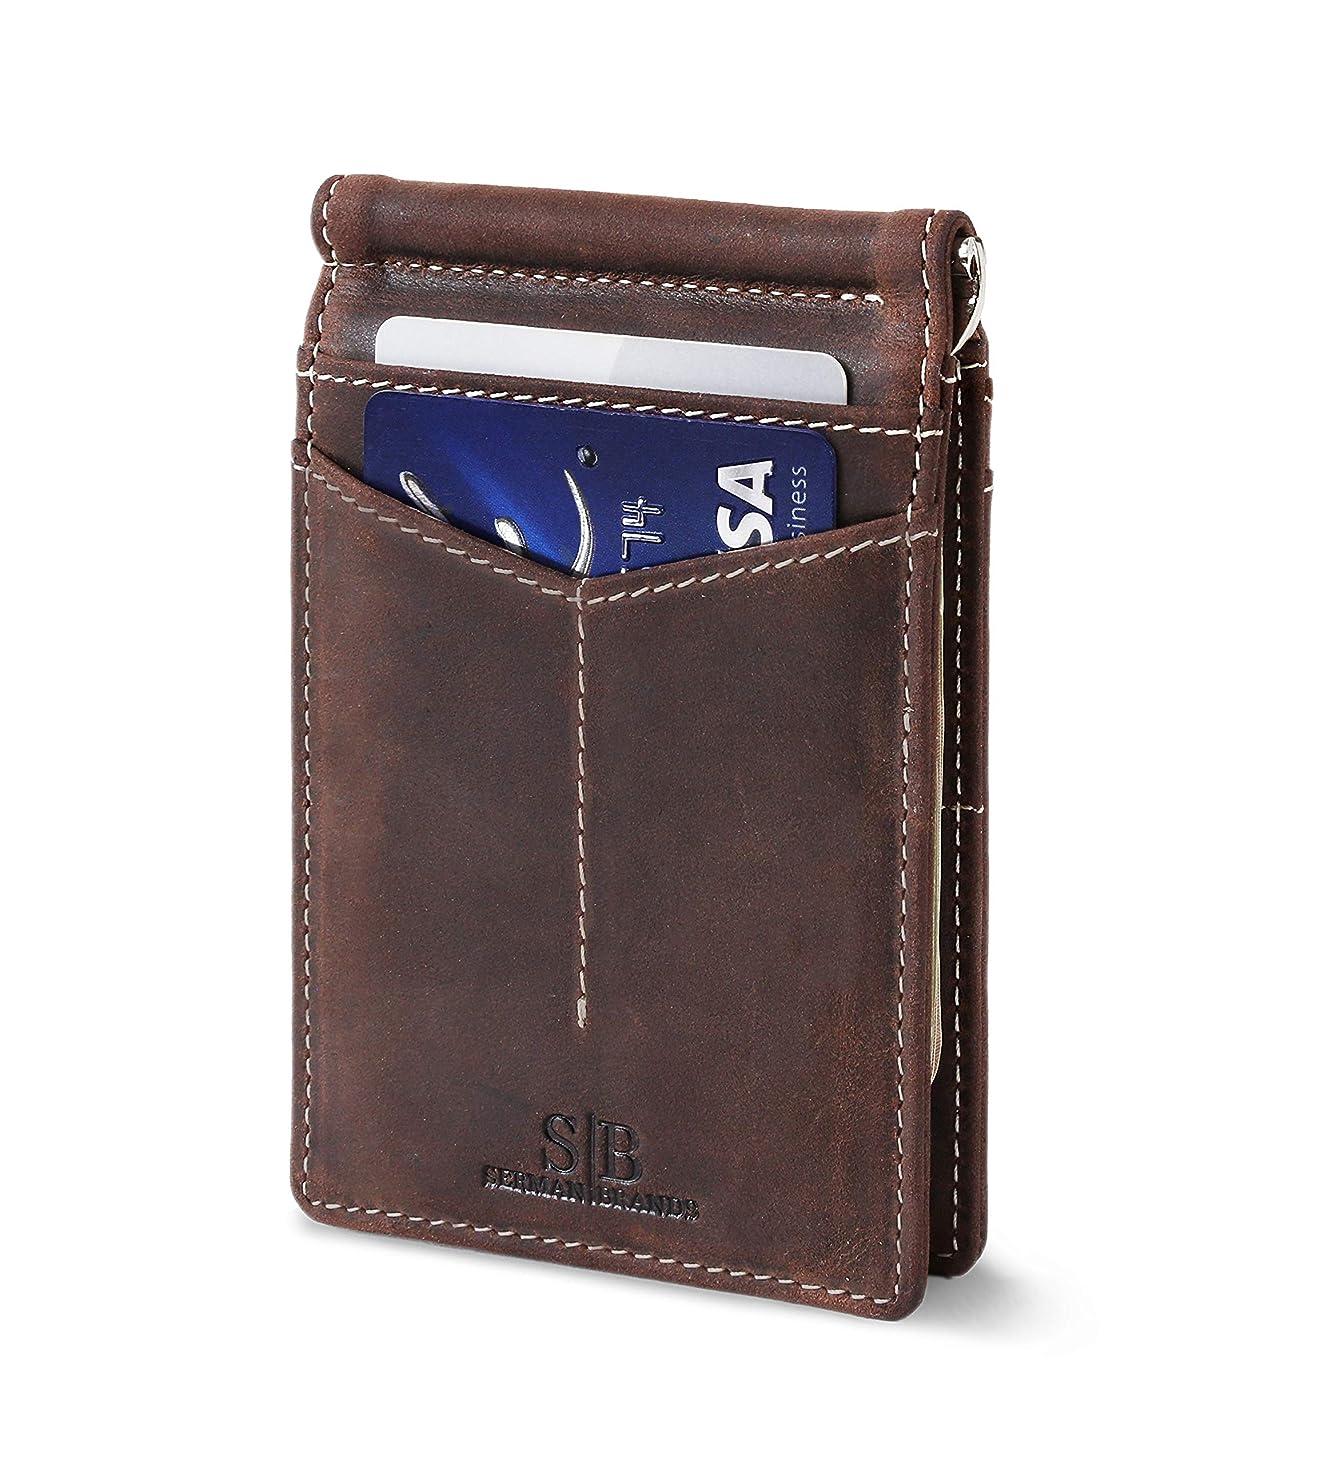 SERMAN BRANDS RFID Blocking Wallet Slim Bifold - Genuine Leather Minimalist Front Pocket Wallets for Men with Money Clip